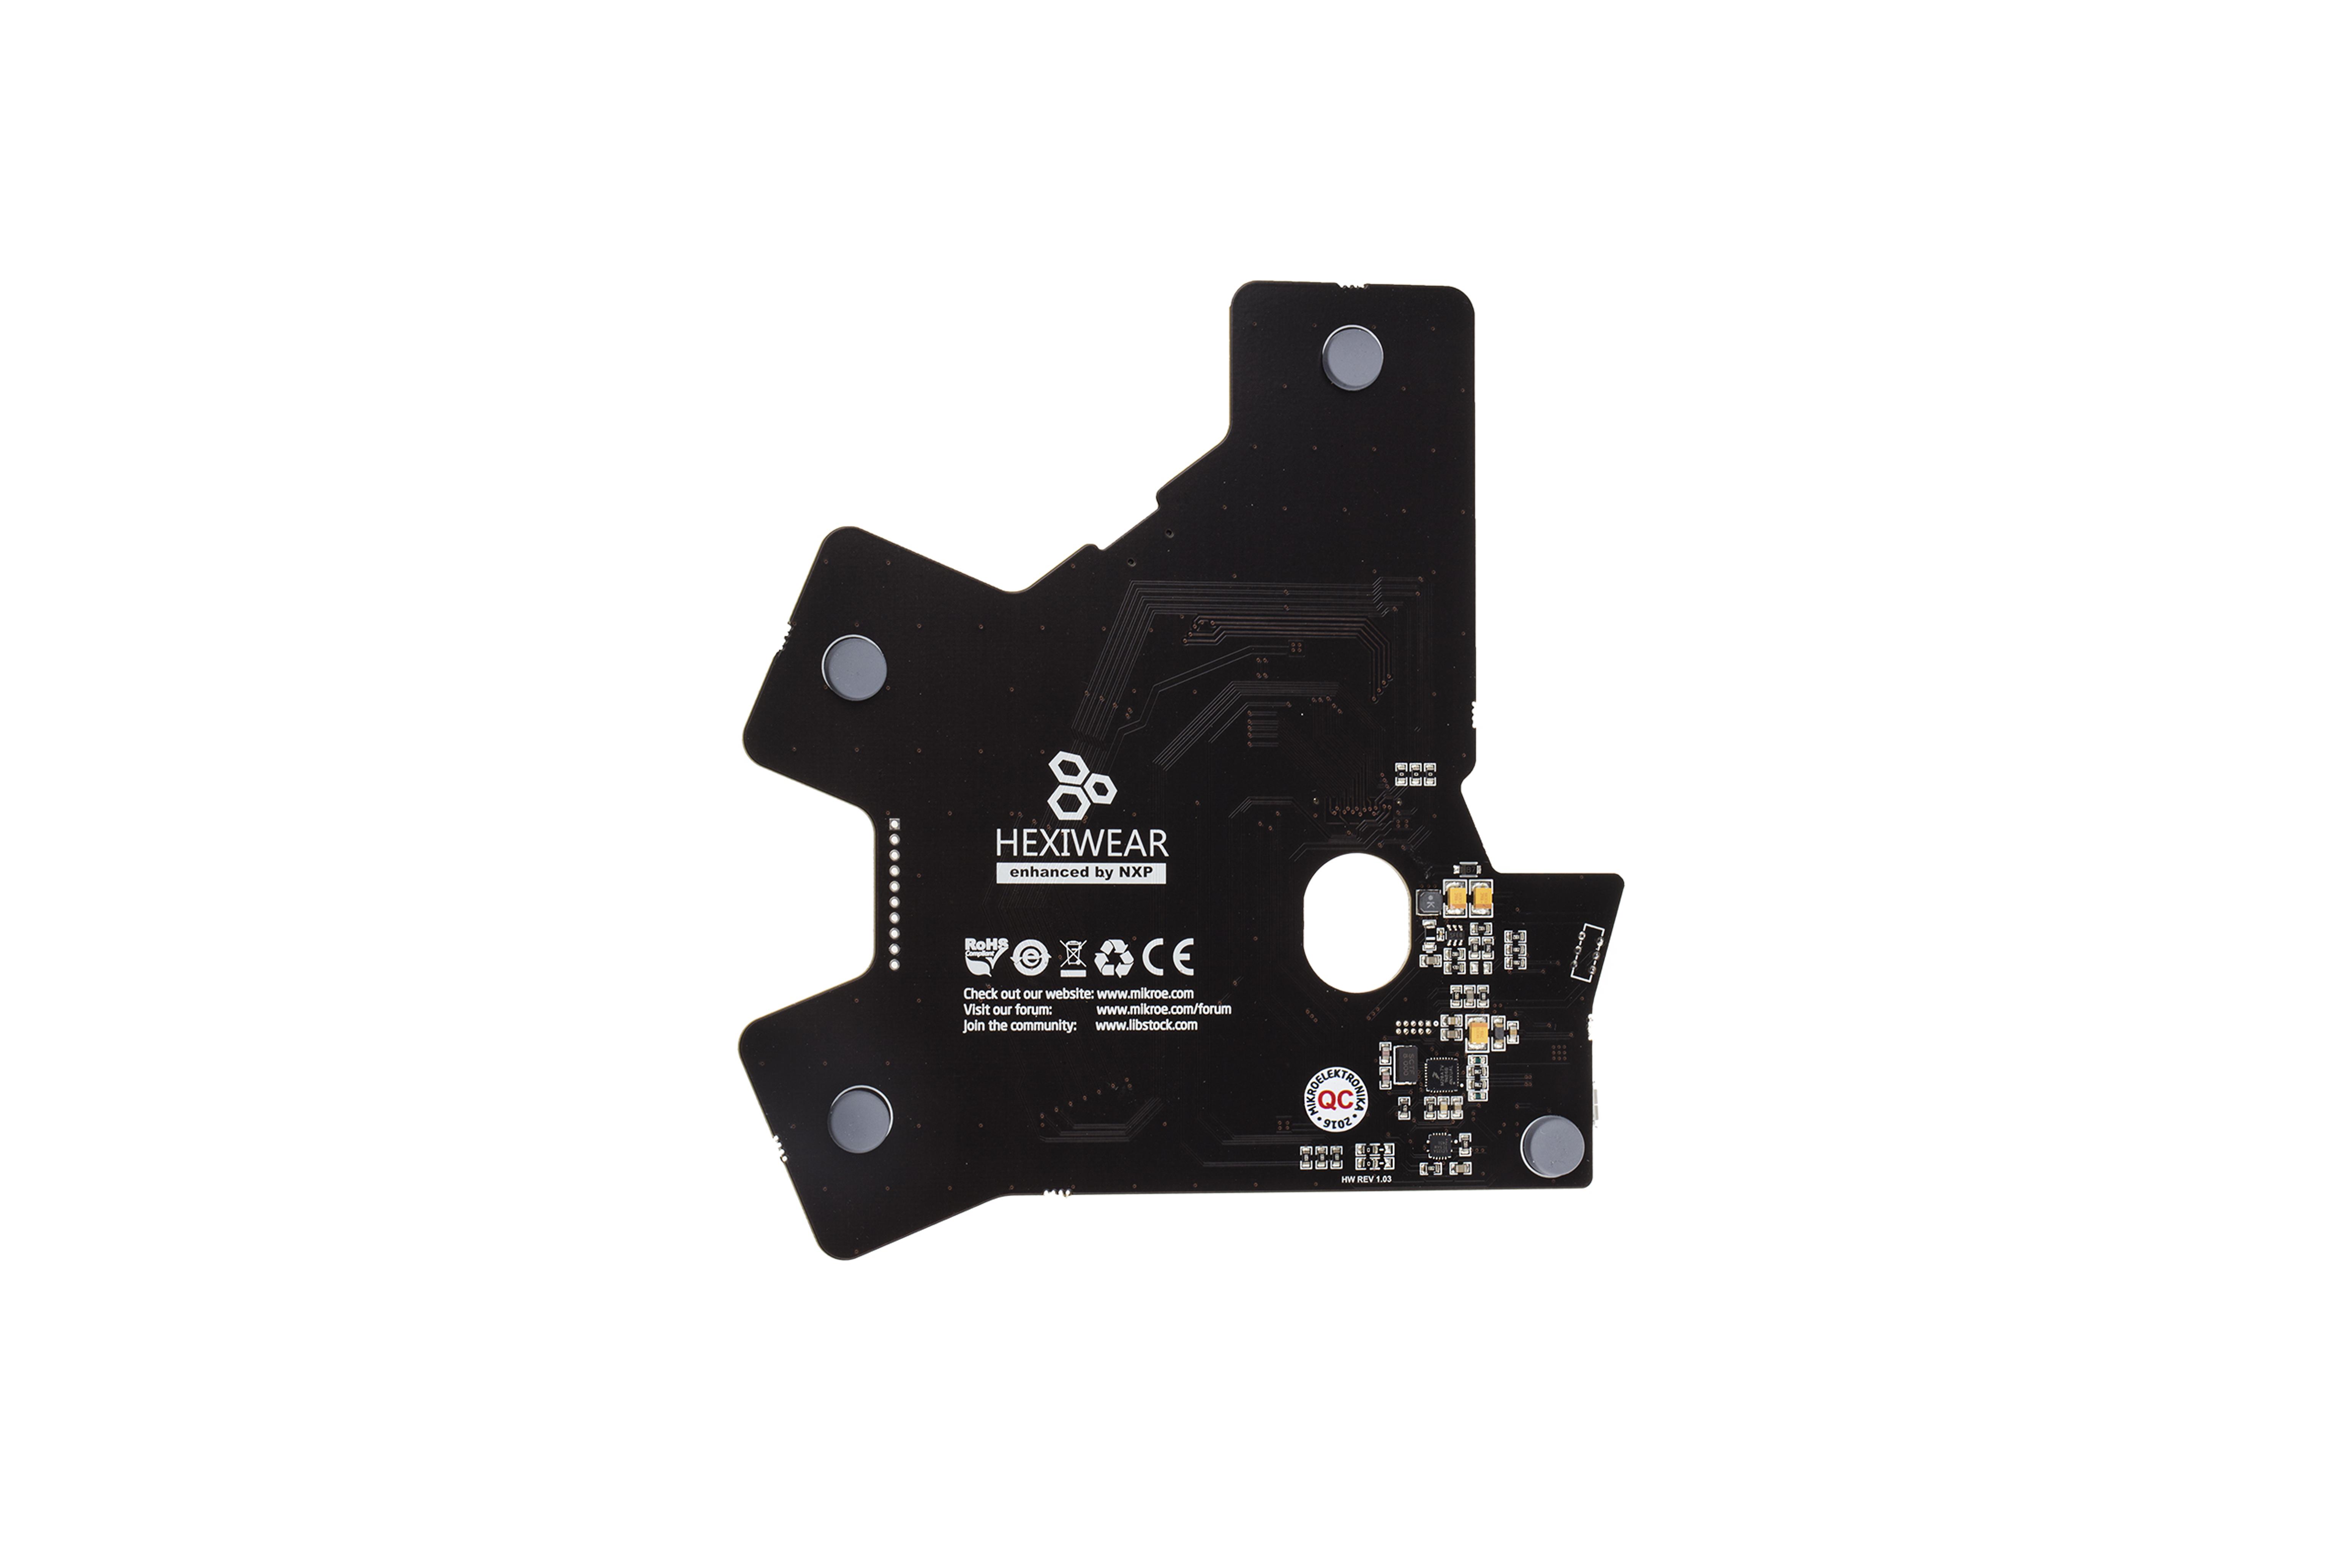 Kit di sviluppoDocking Station HexiWear IoT